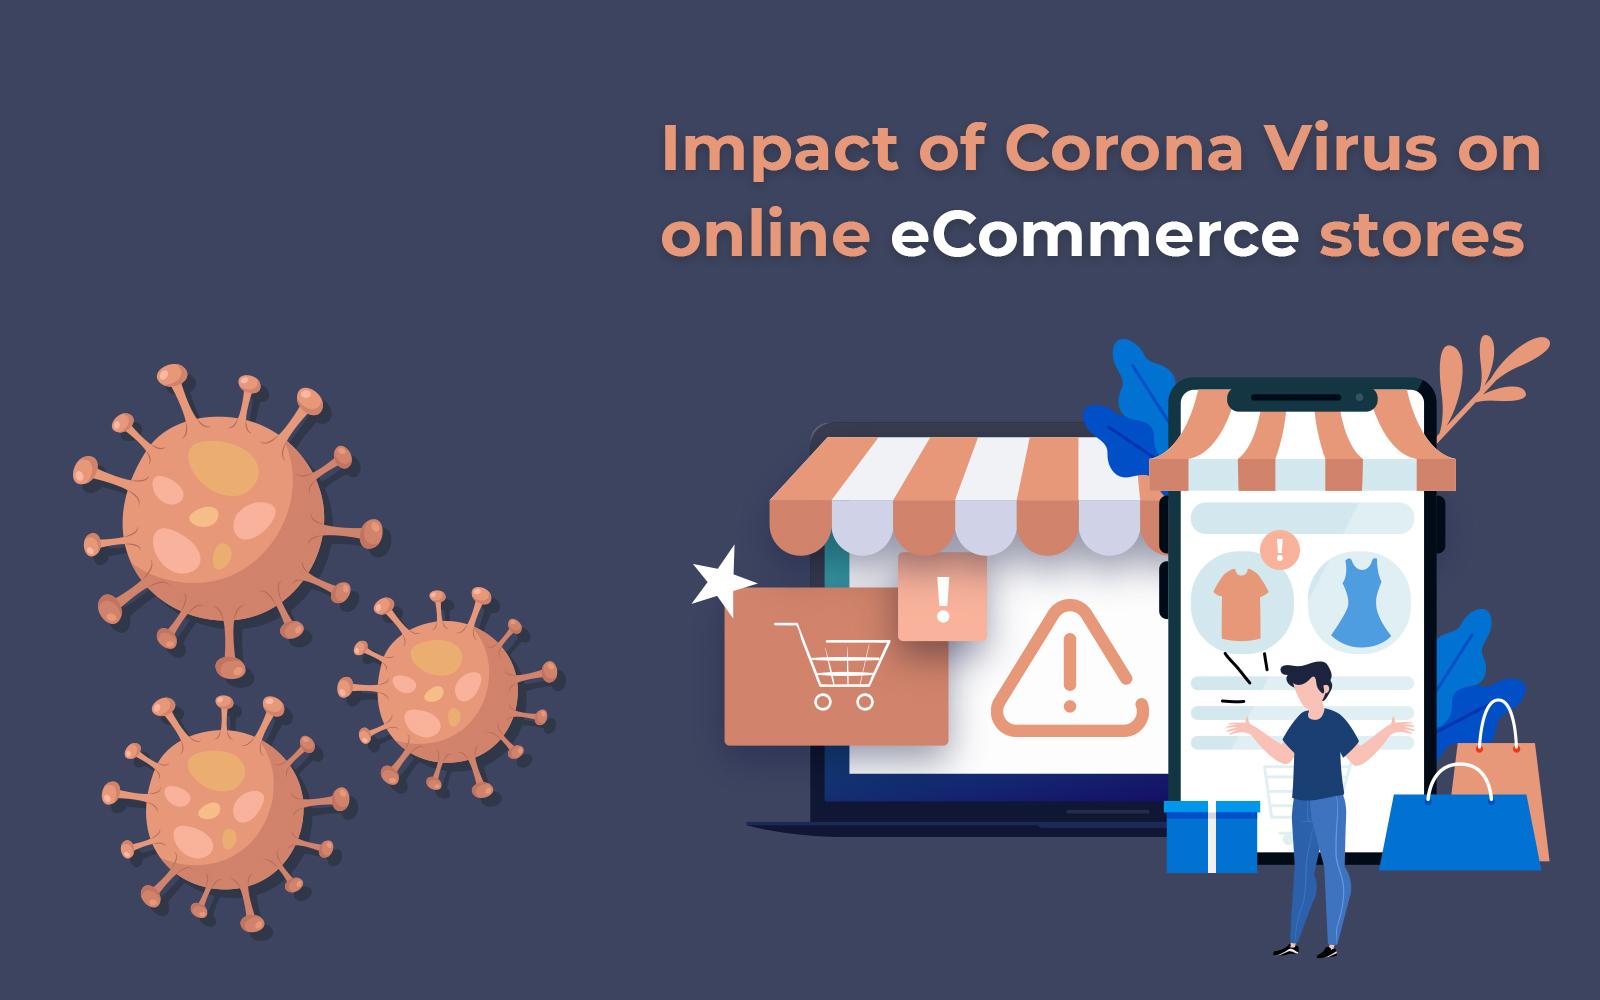 Impact-of-Covid-19-on-online-eCommerce-softsuave